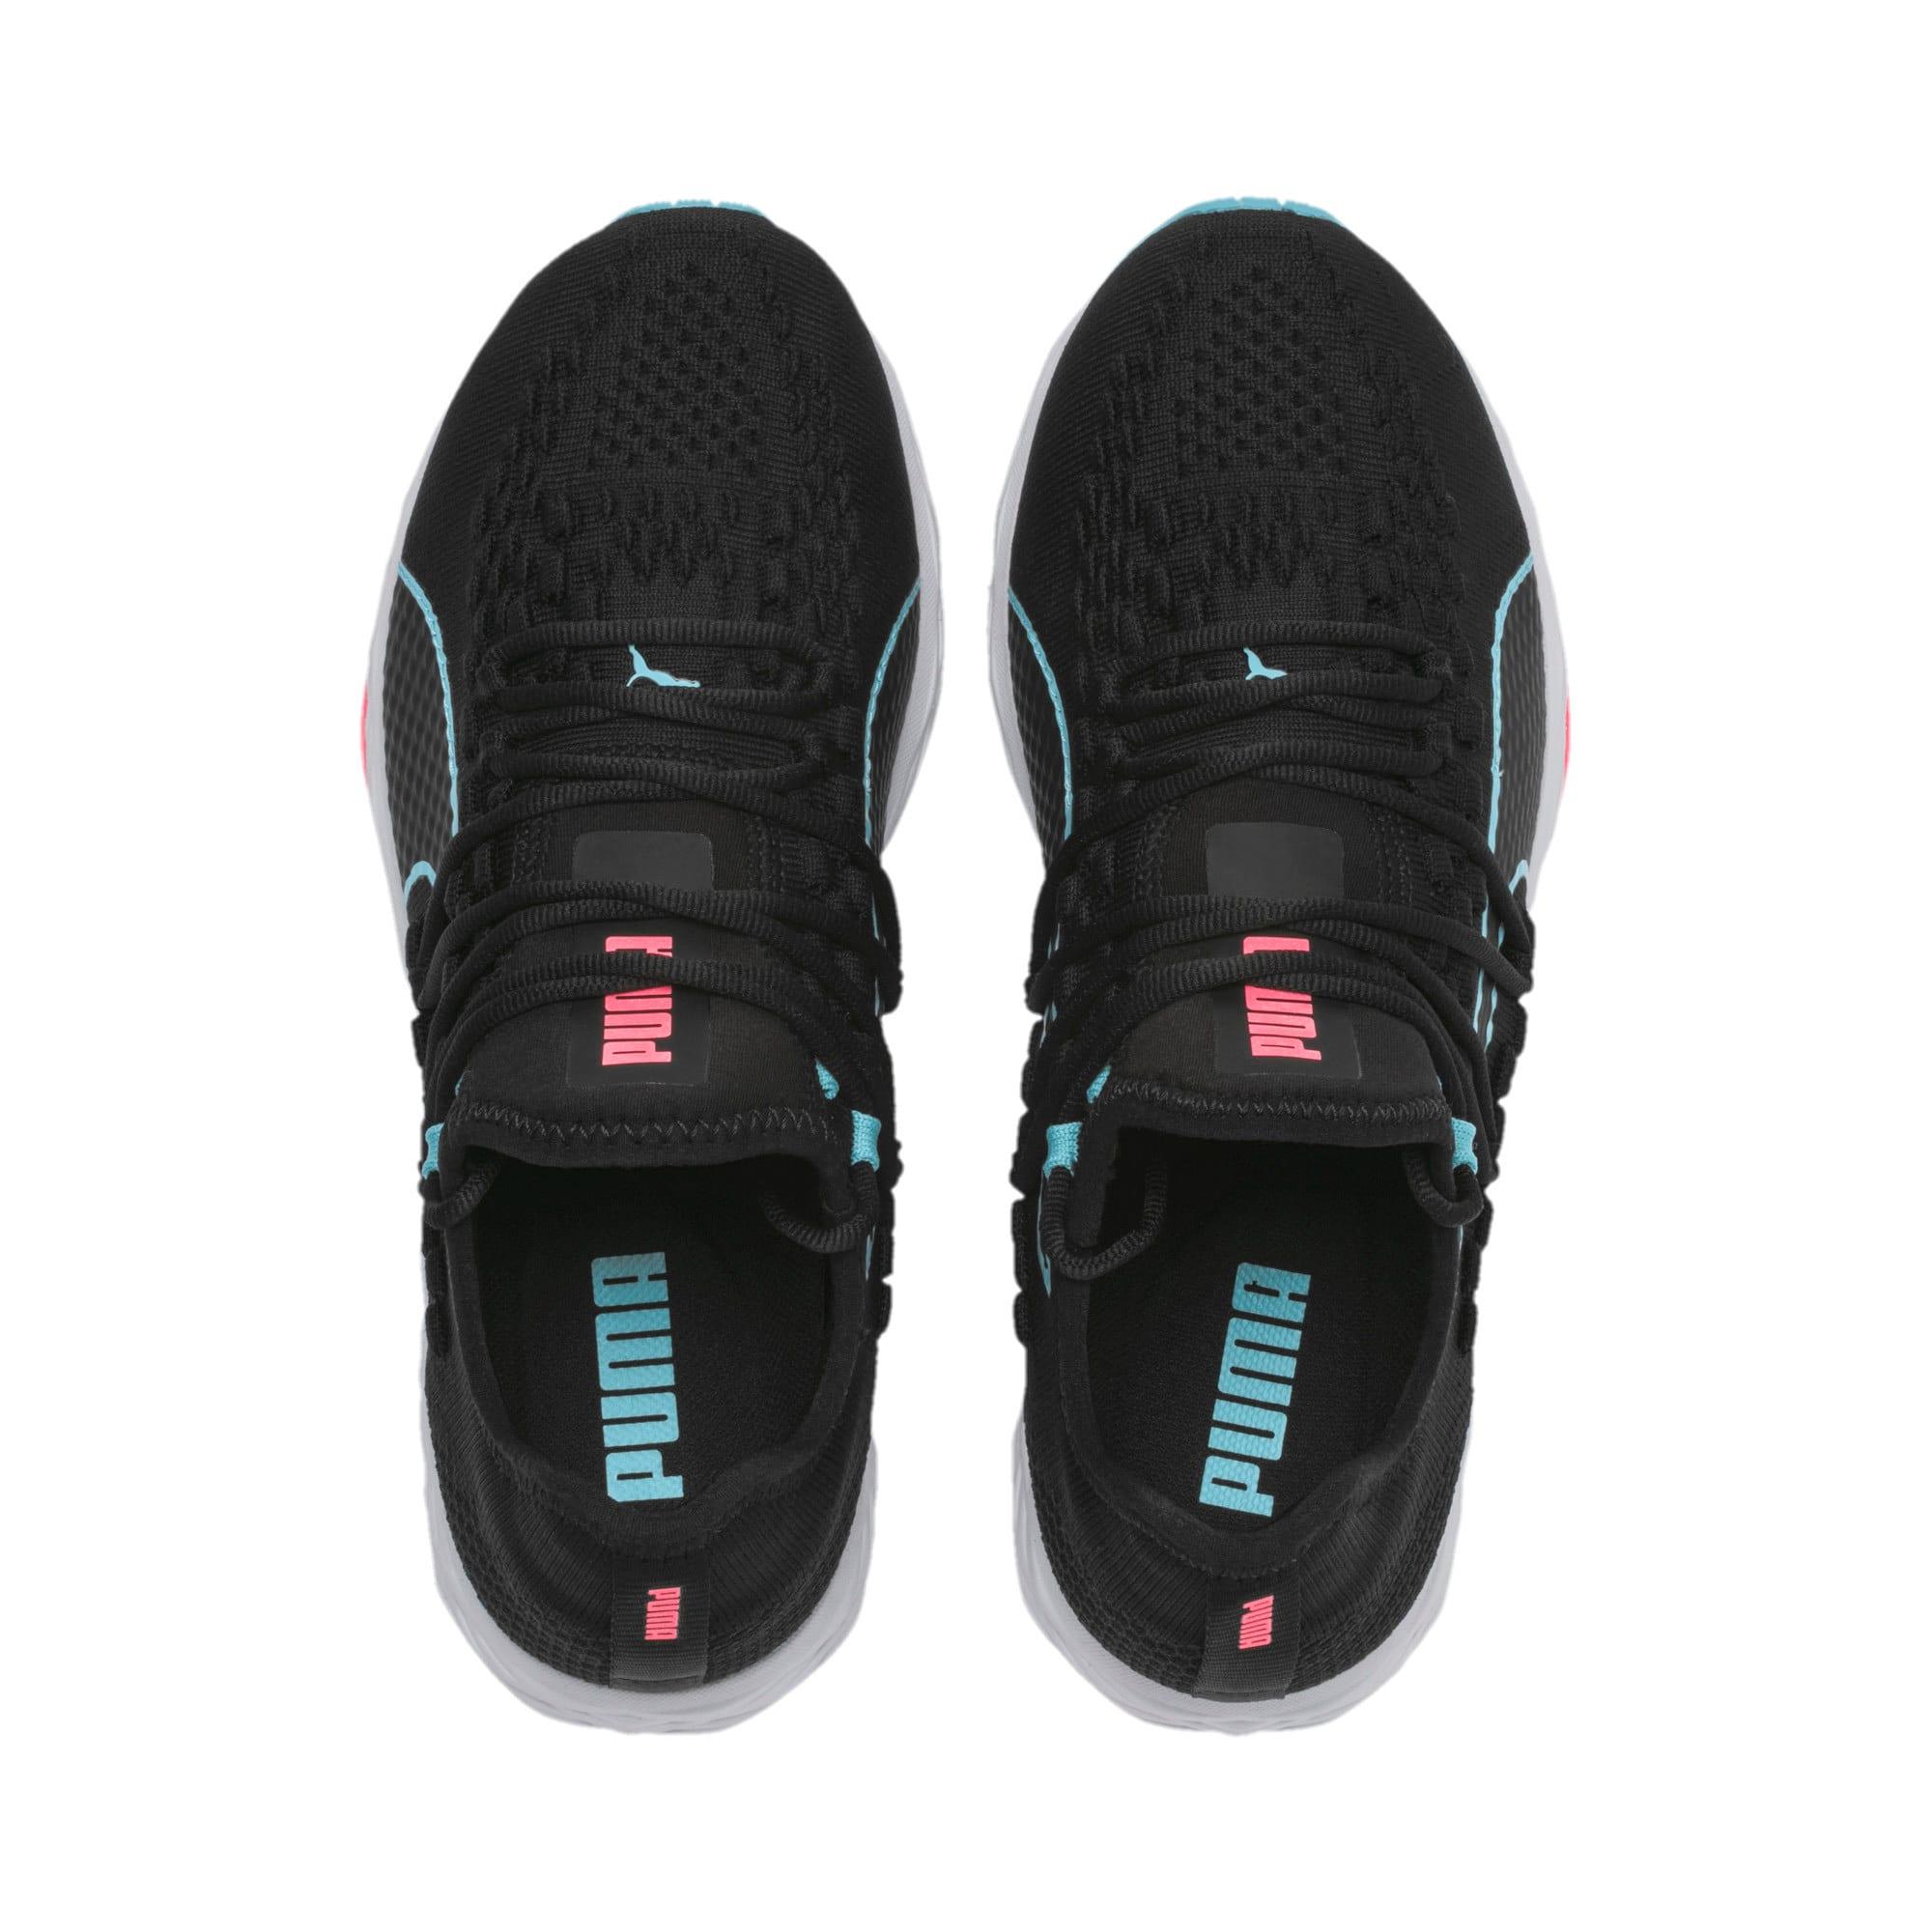 Thumbnail 7 of SPEED RACER Women's Running Shoes, Black-Milky Blue-Pink Alert, medium